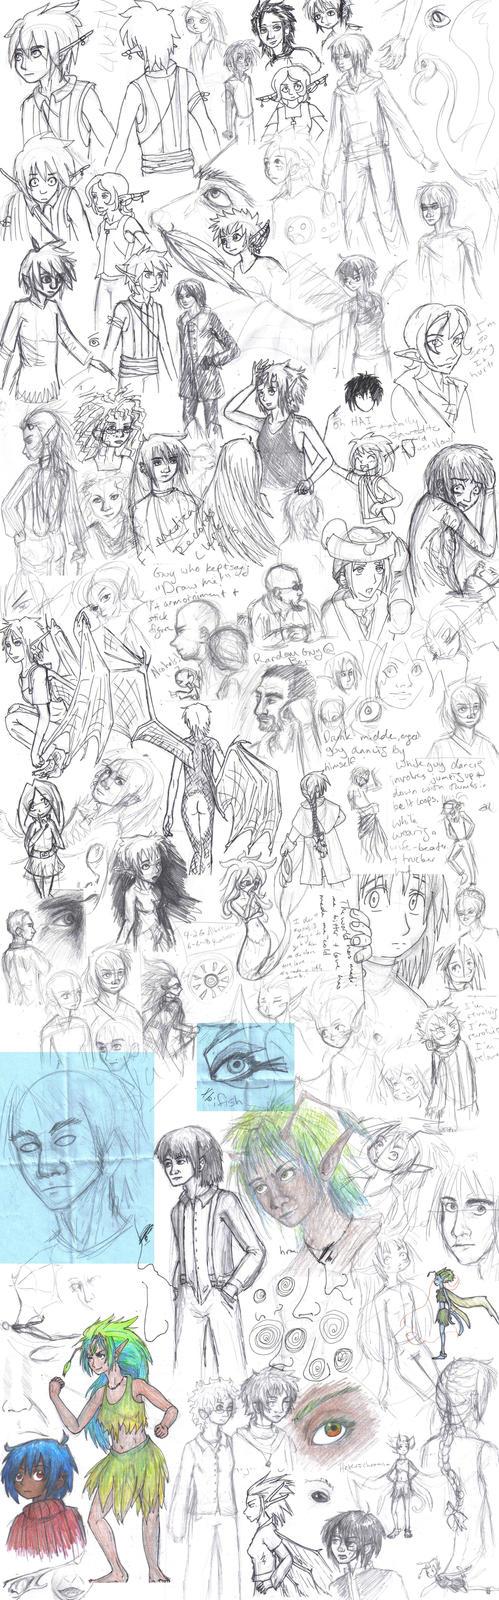 Doodle Slushy VIII by persephone-the-fish